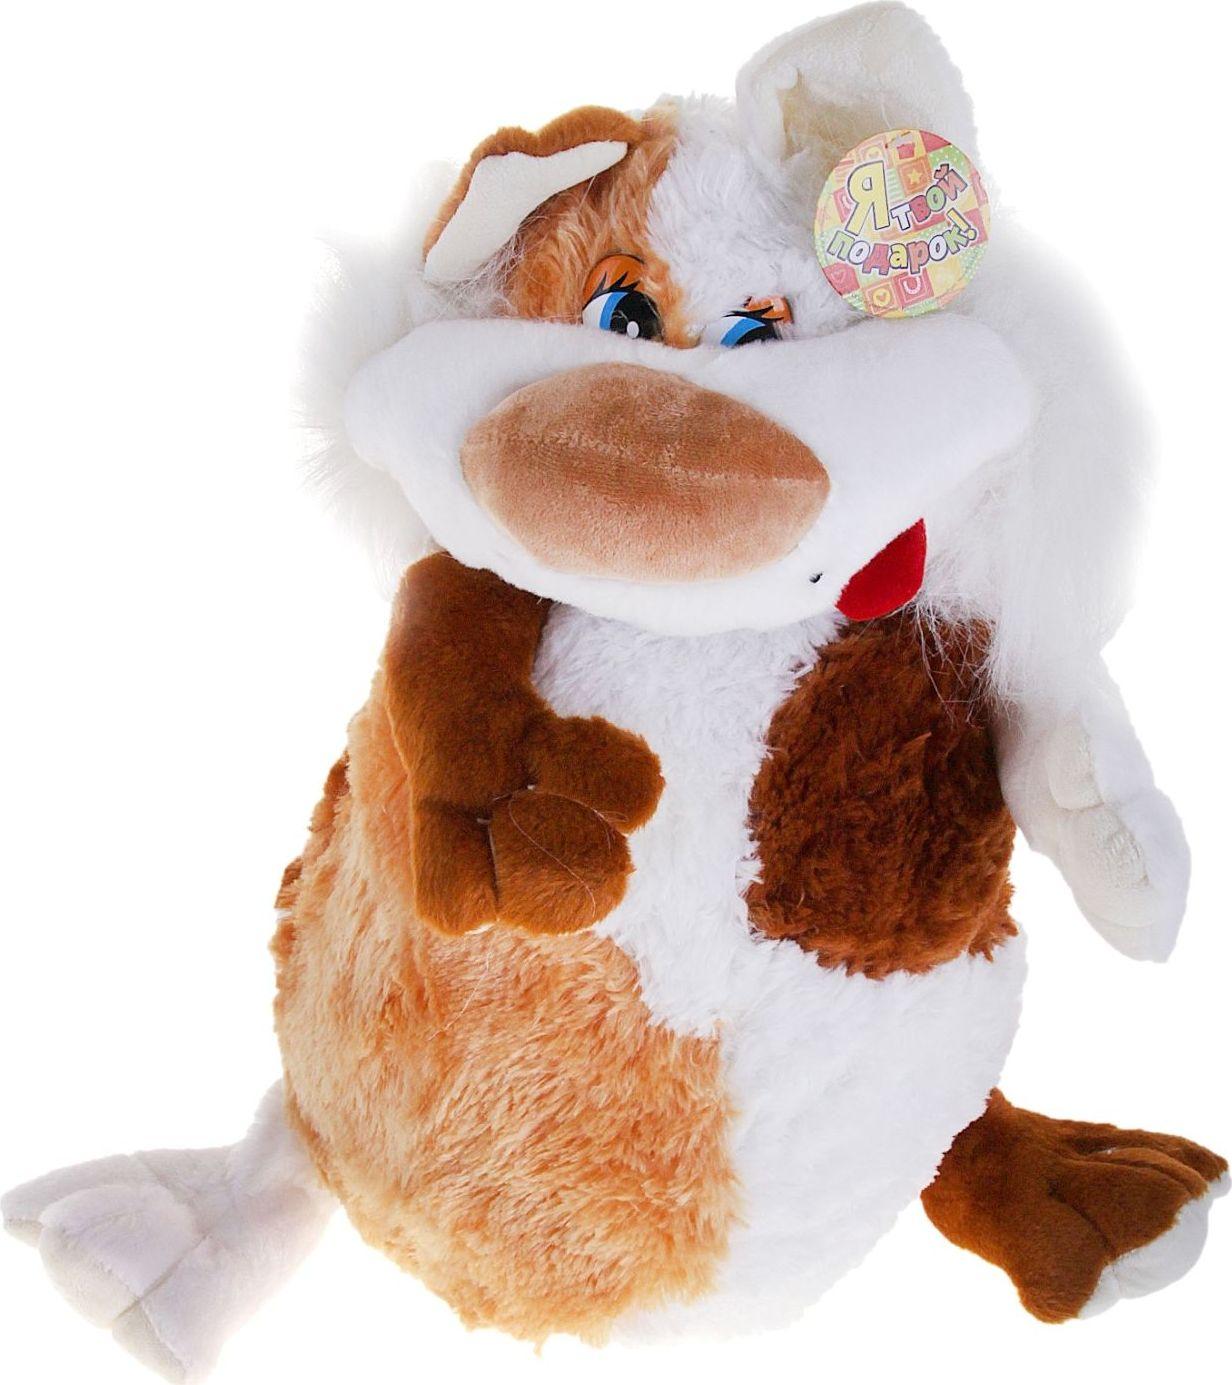 Sima-land Мягкая игрушка Кот-проглот 327545 гигантский магнит на холодильник кот проглот